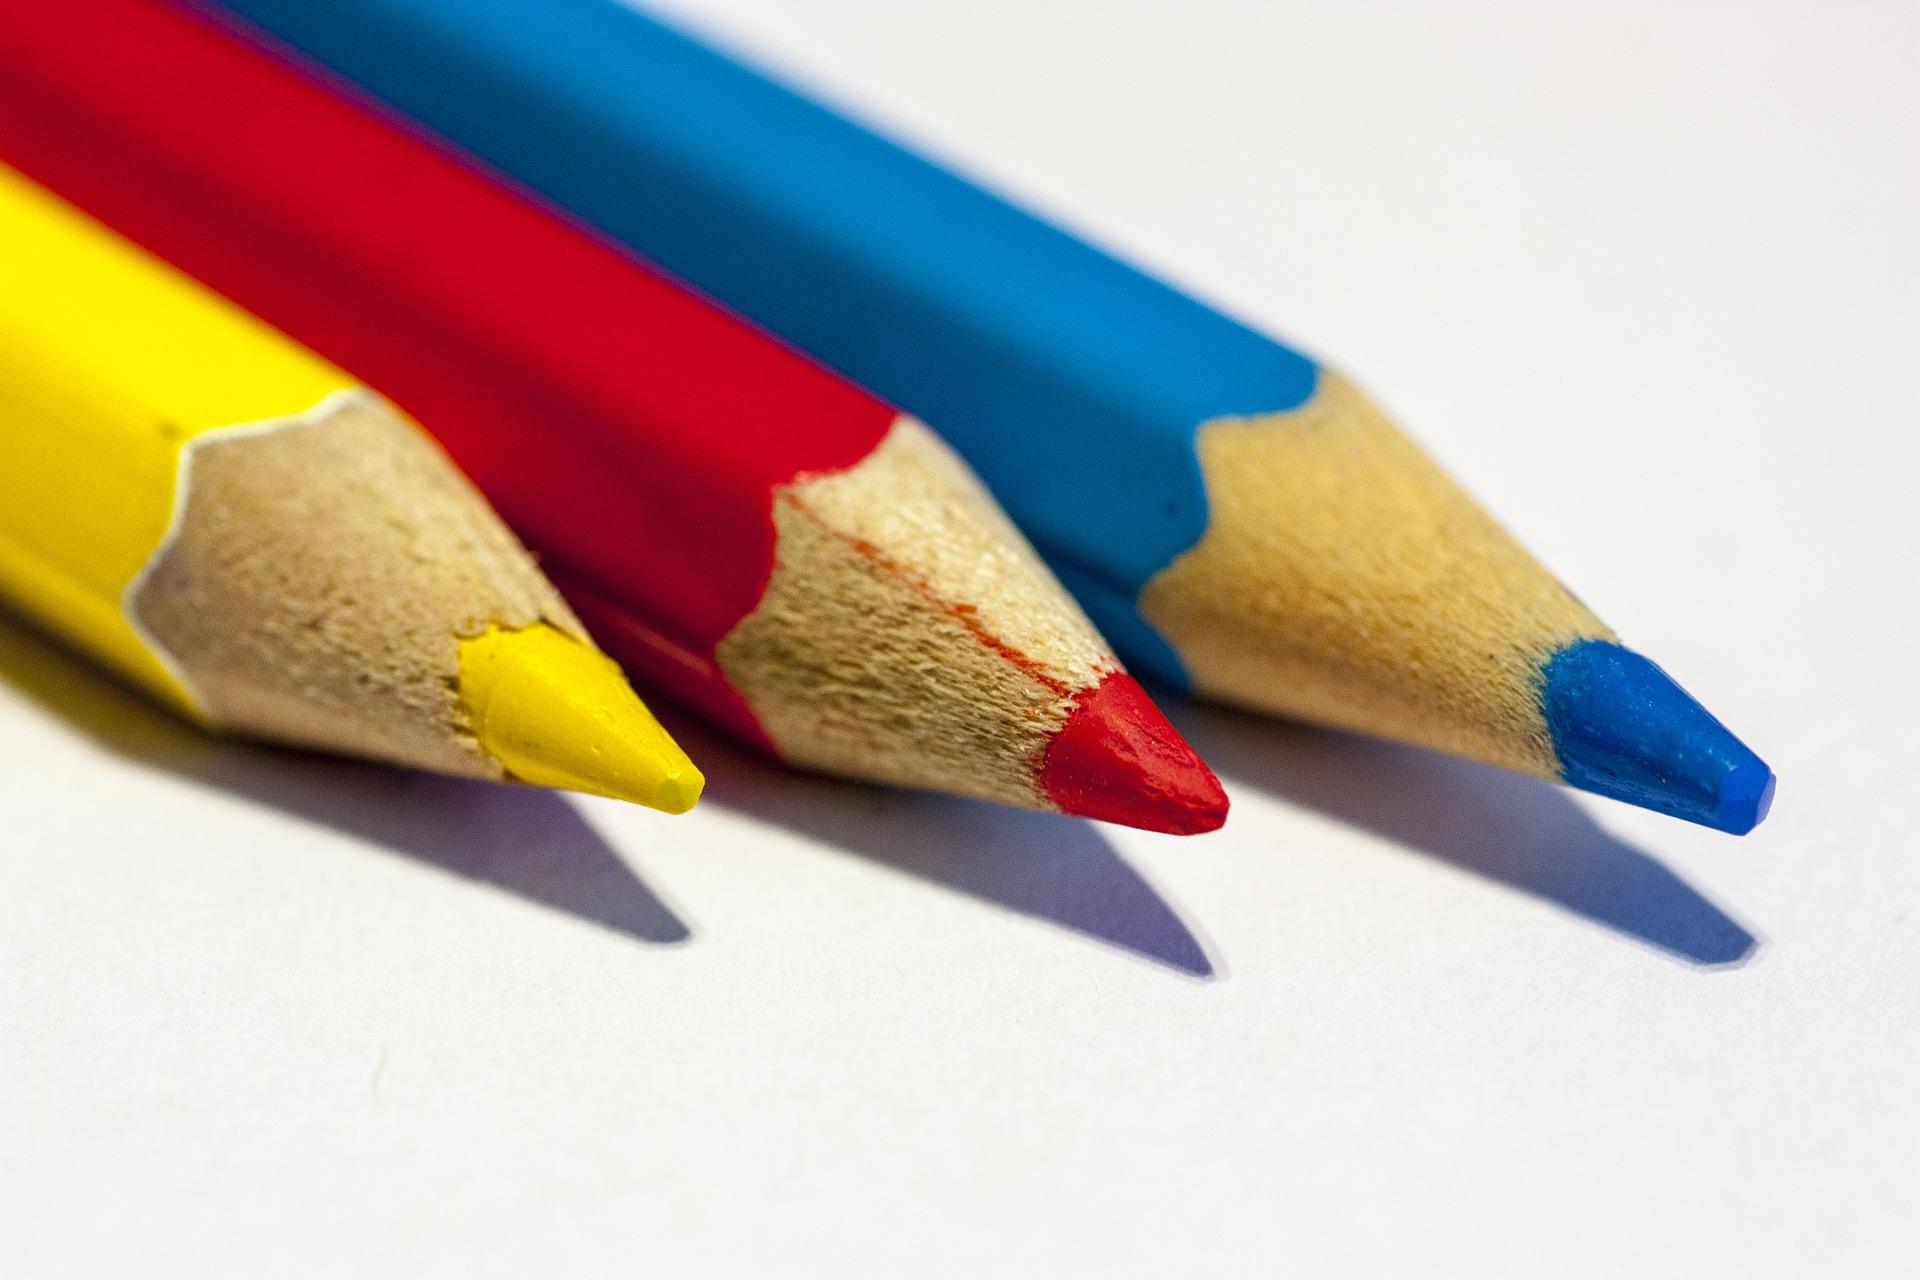 pens-1080451_1920